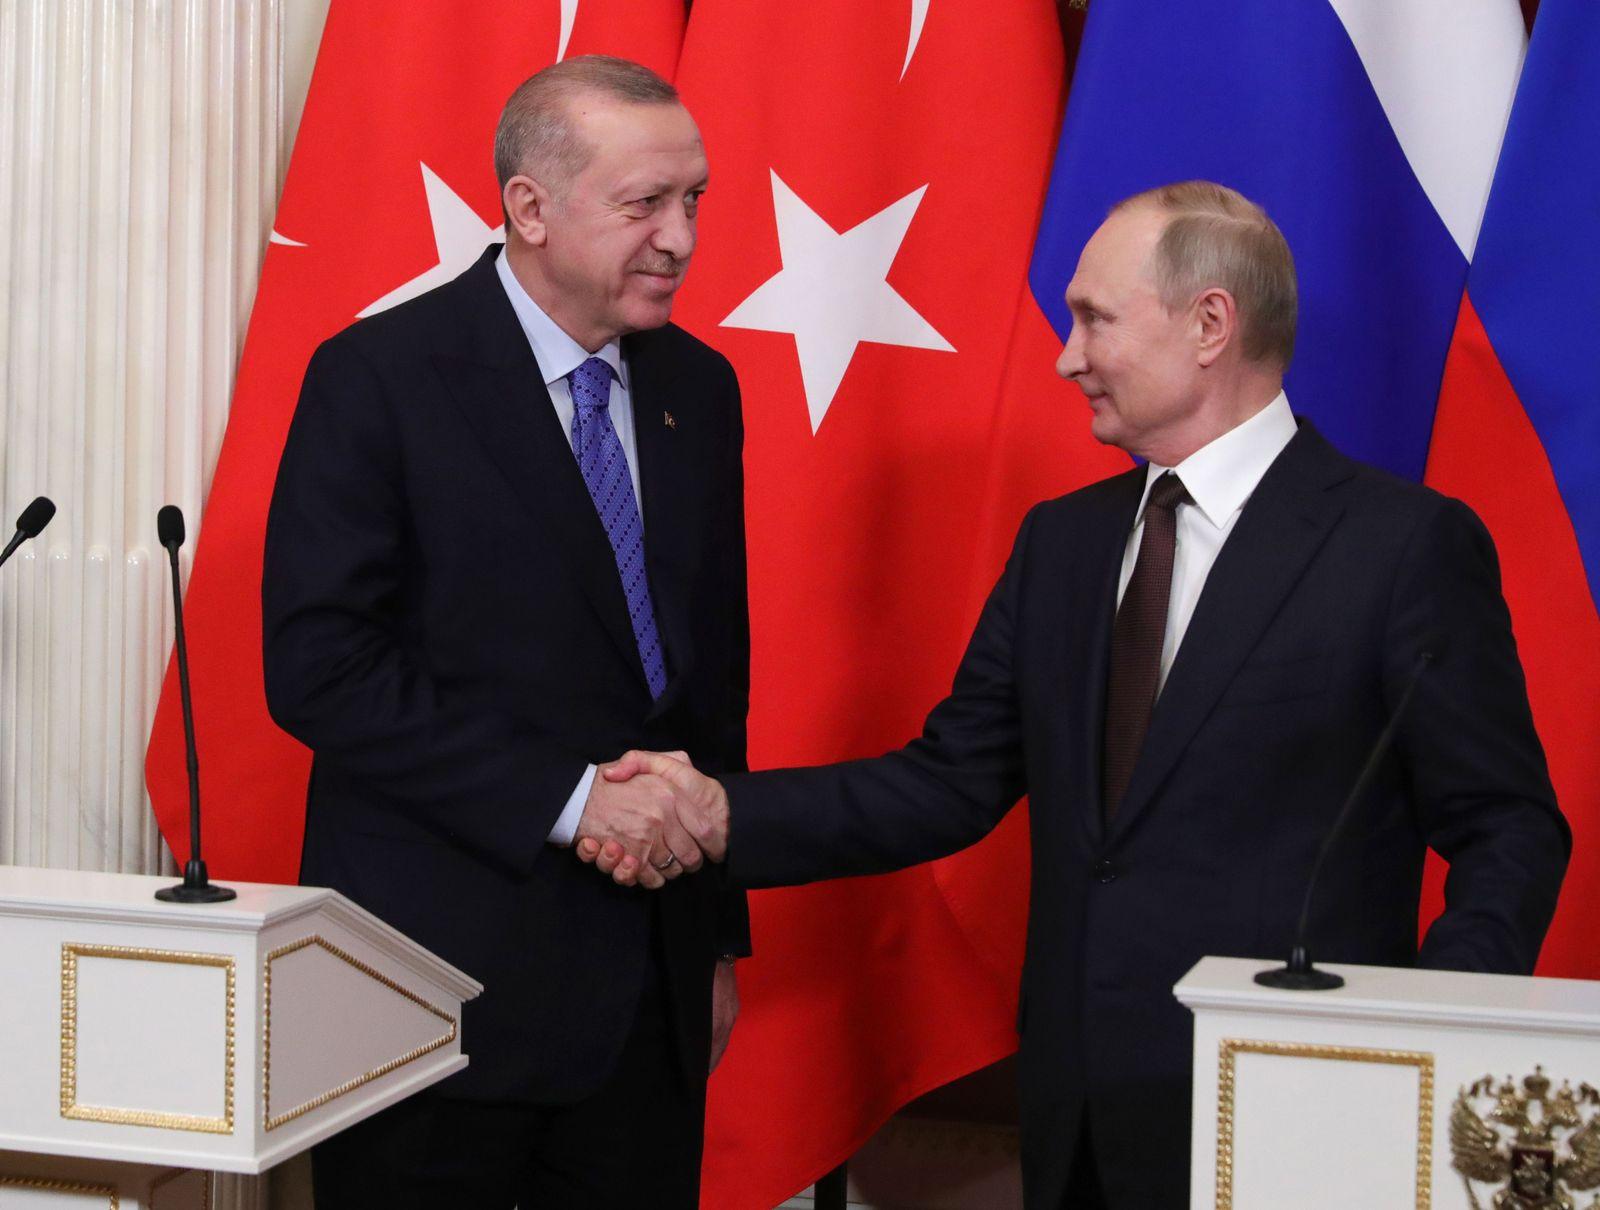 Turkish President Recep Tayyip Erdogan visits Moscow, Russian Federation - 05 Mar 2020